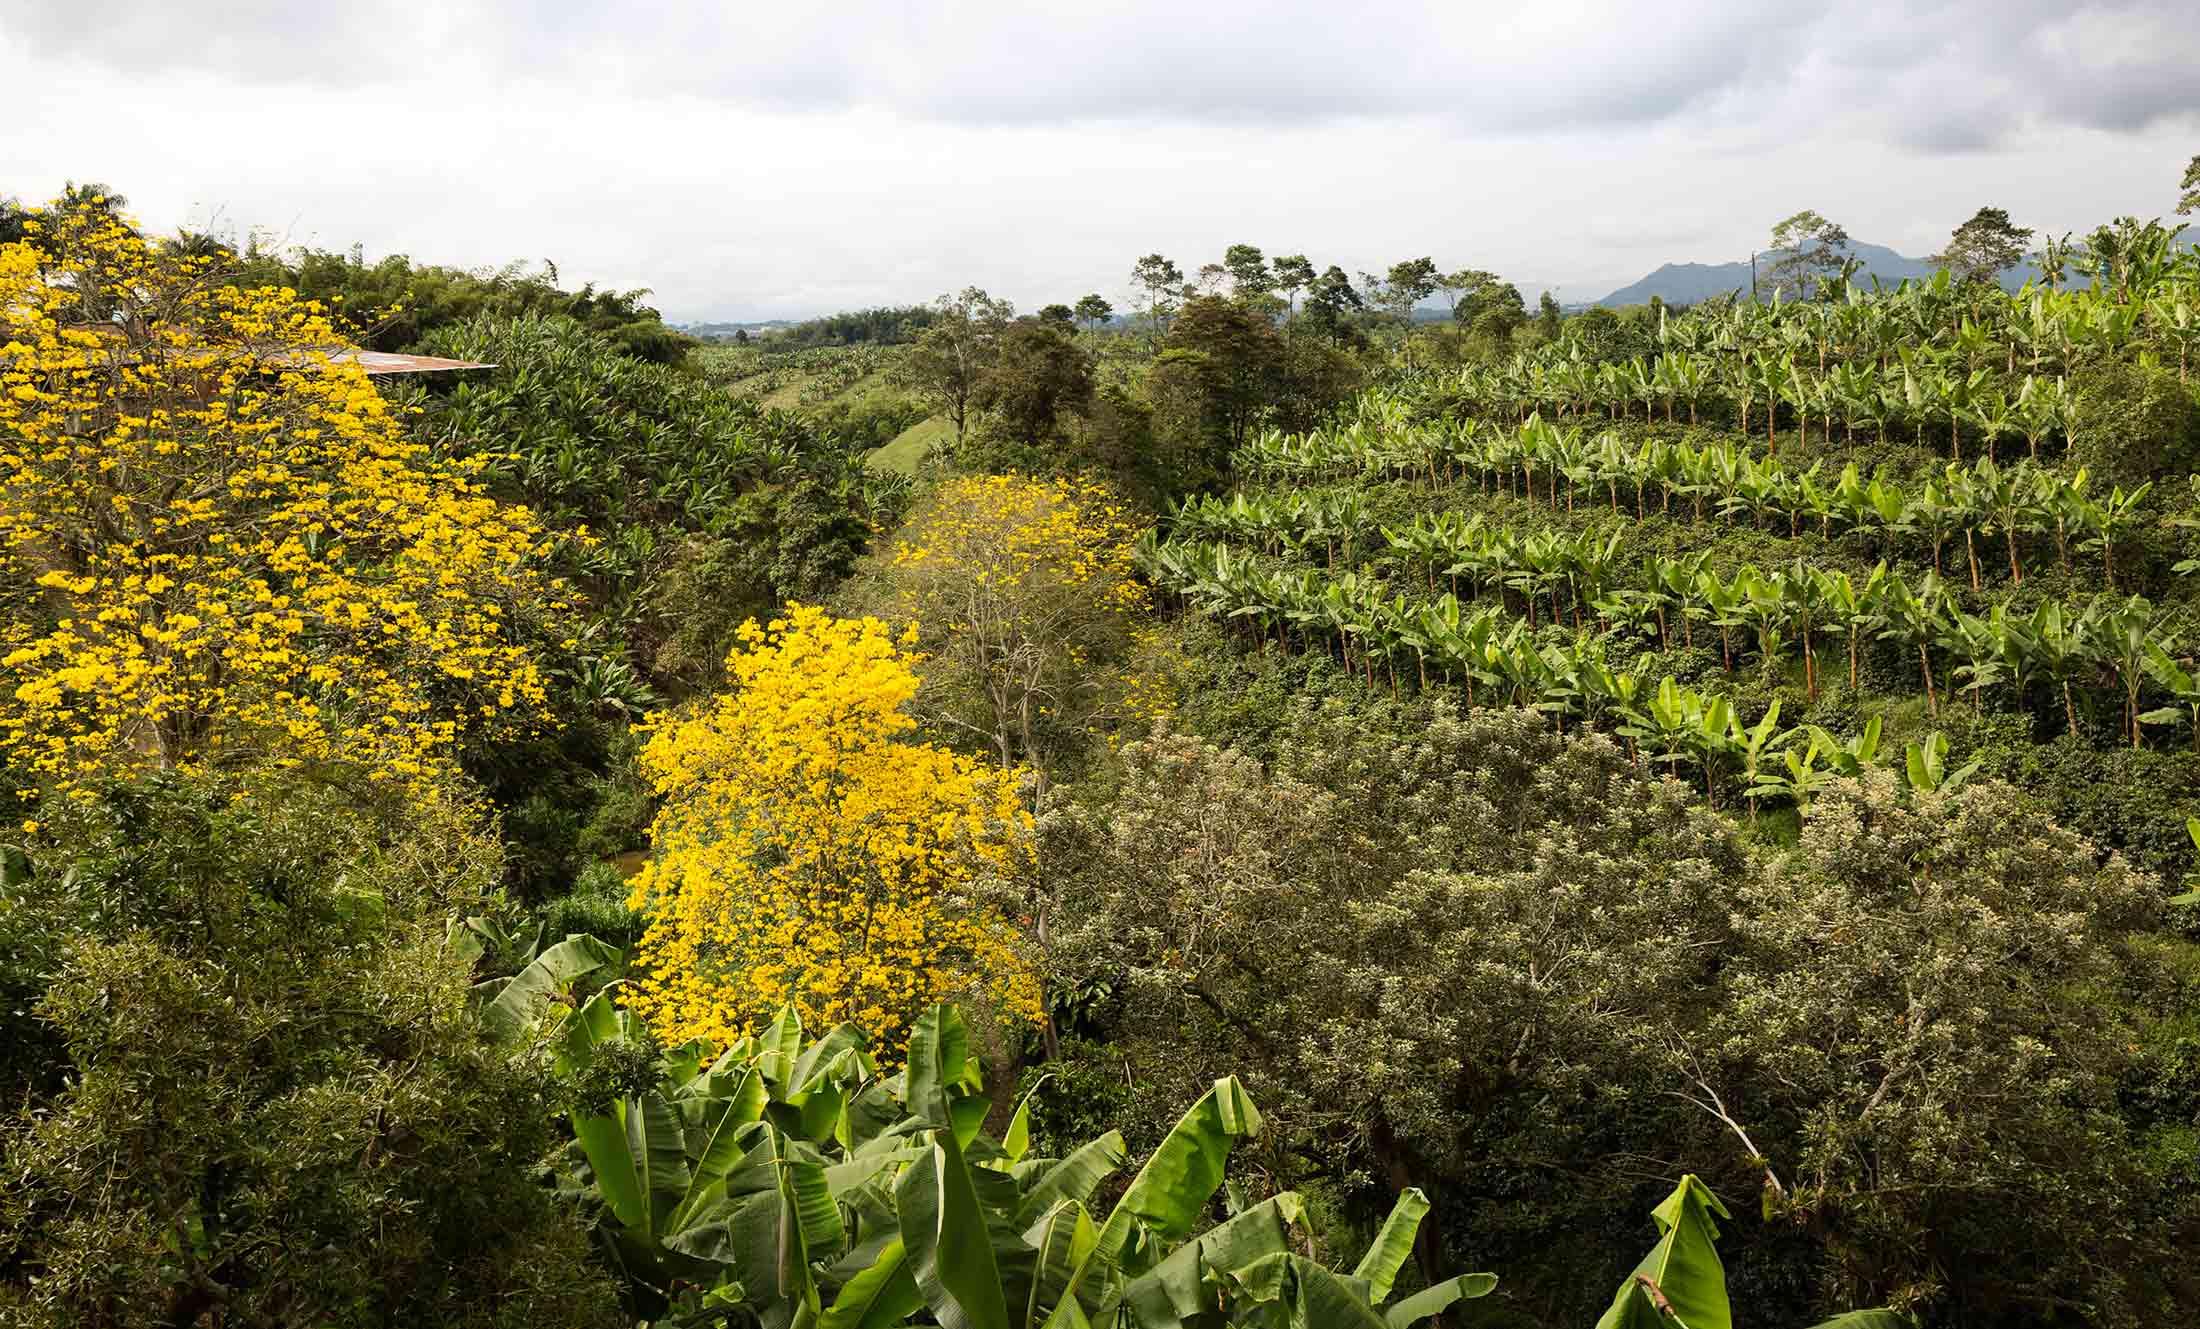 Guaduales und Bioversität beim Kaffeeanbau in Kolumbien.